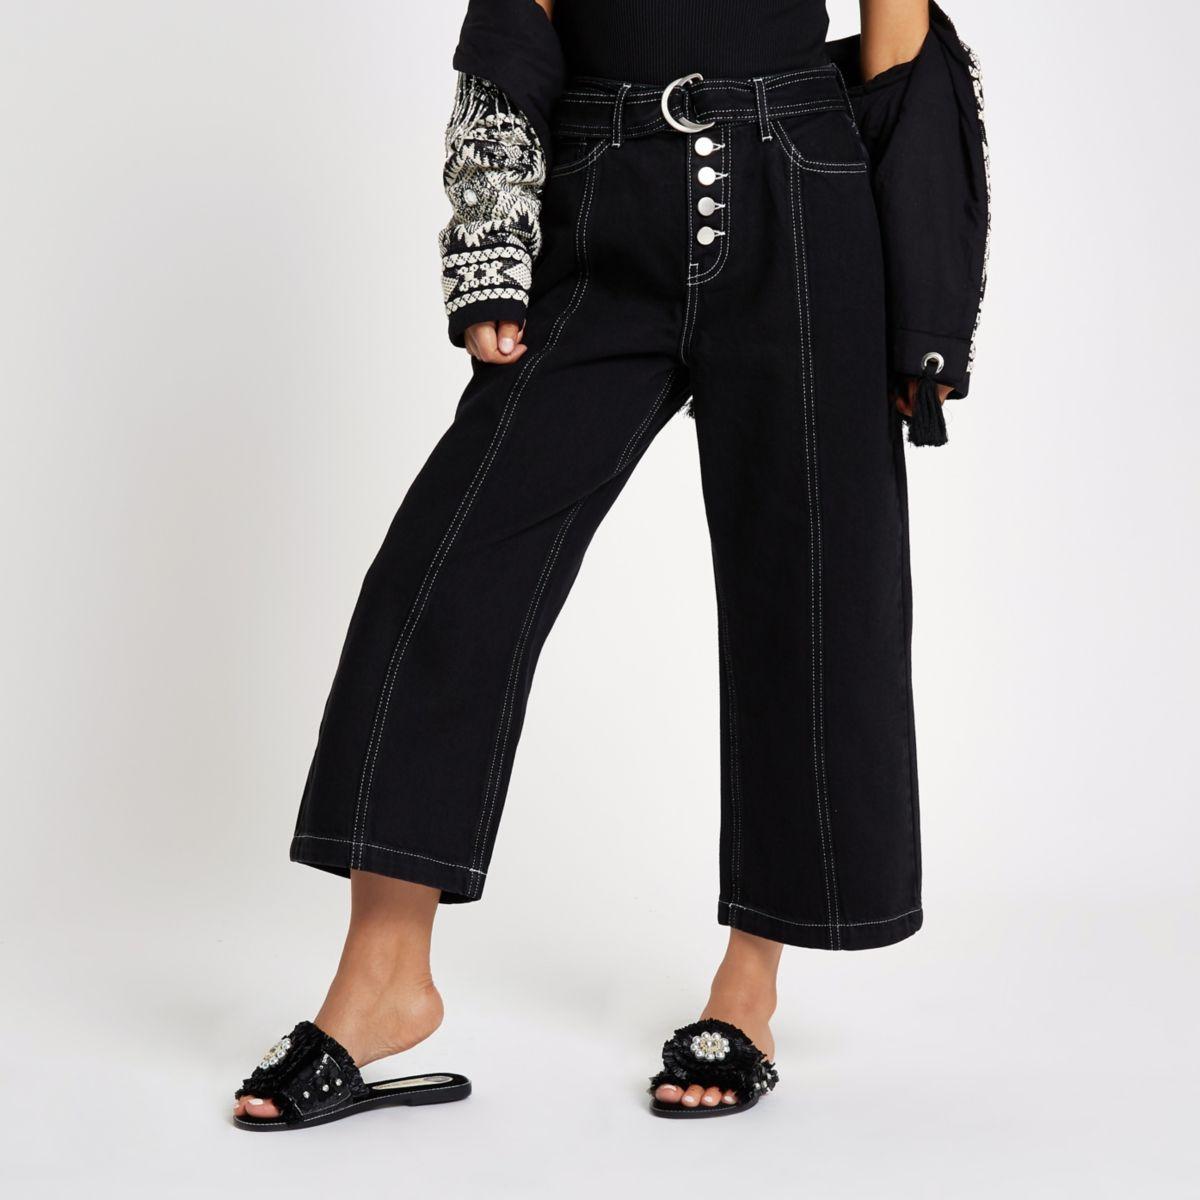 Petite black belted wide leg jeans